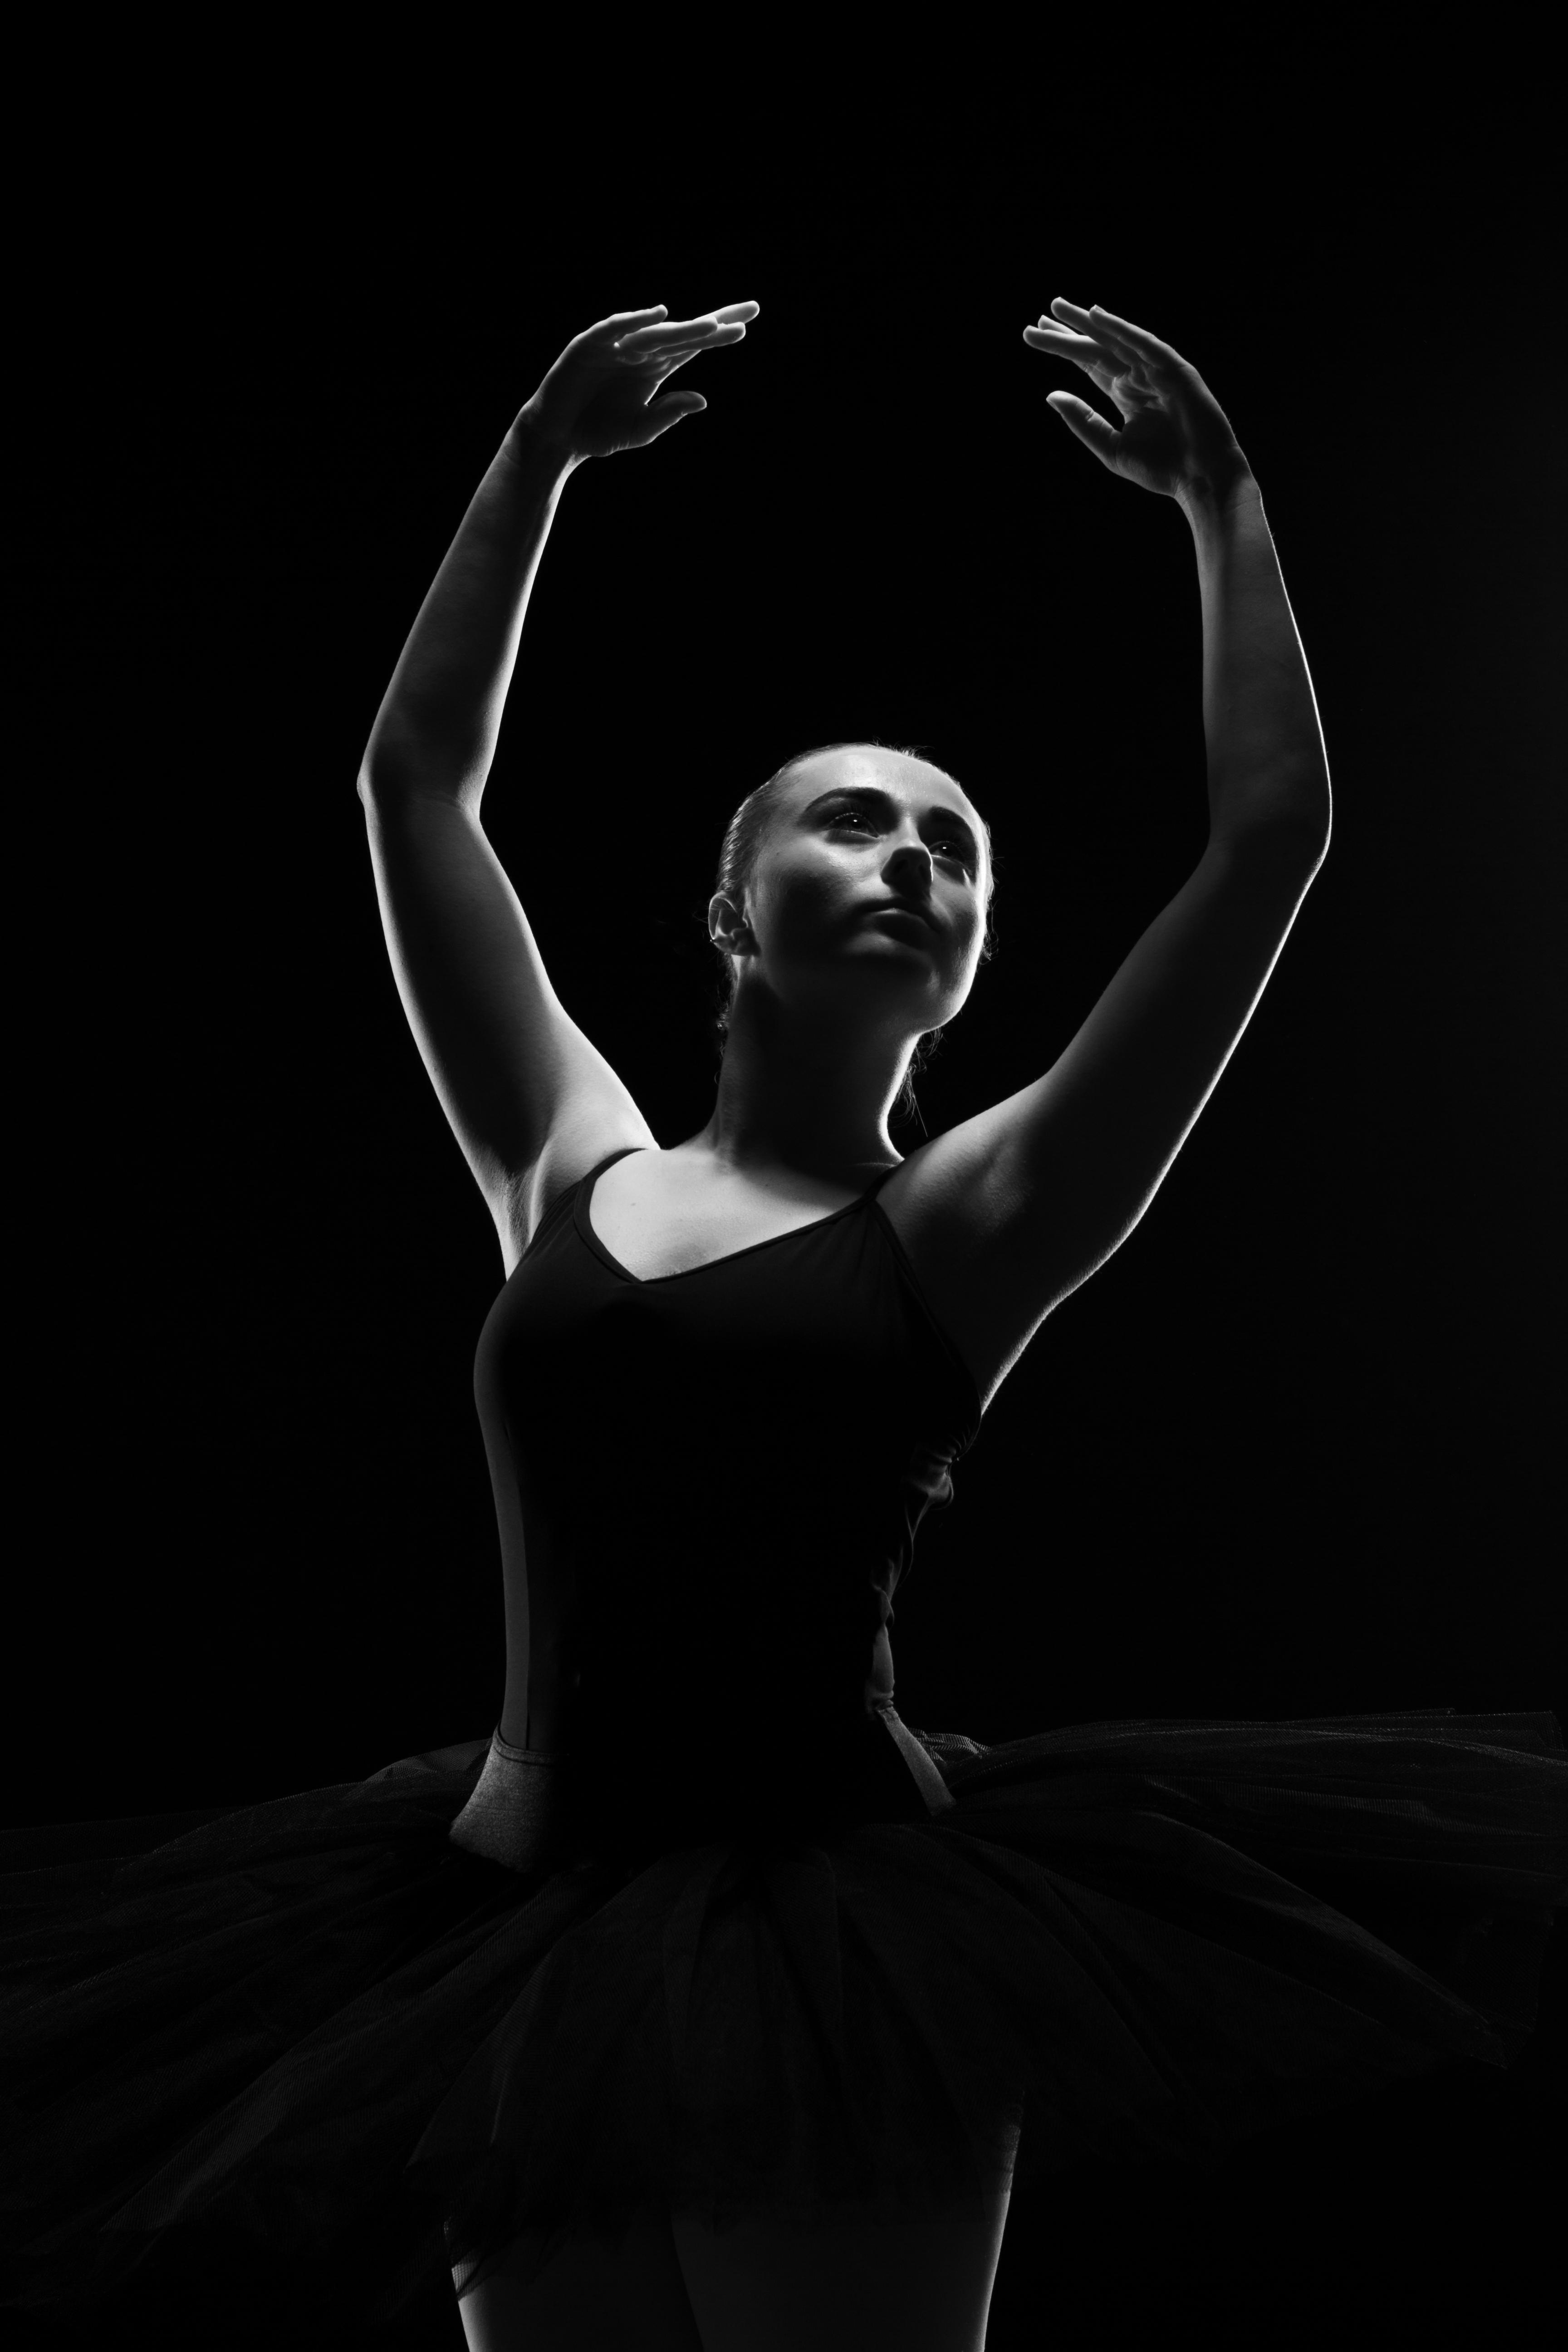 Ballerina Girl 1